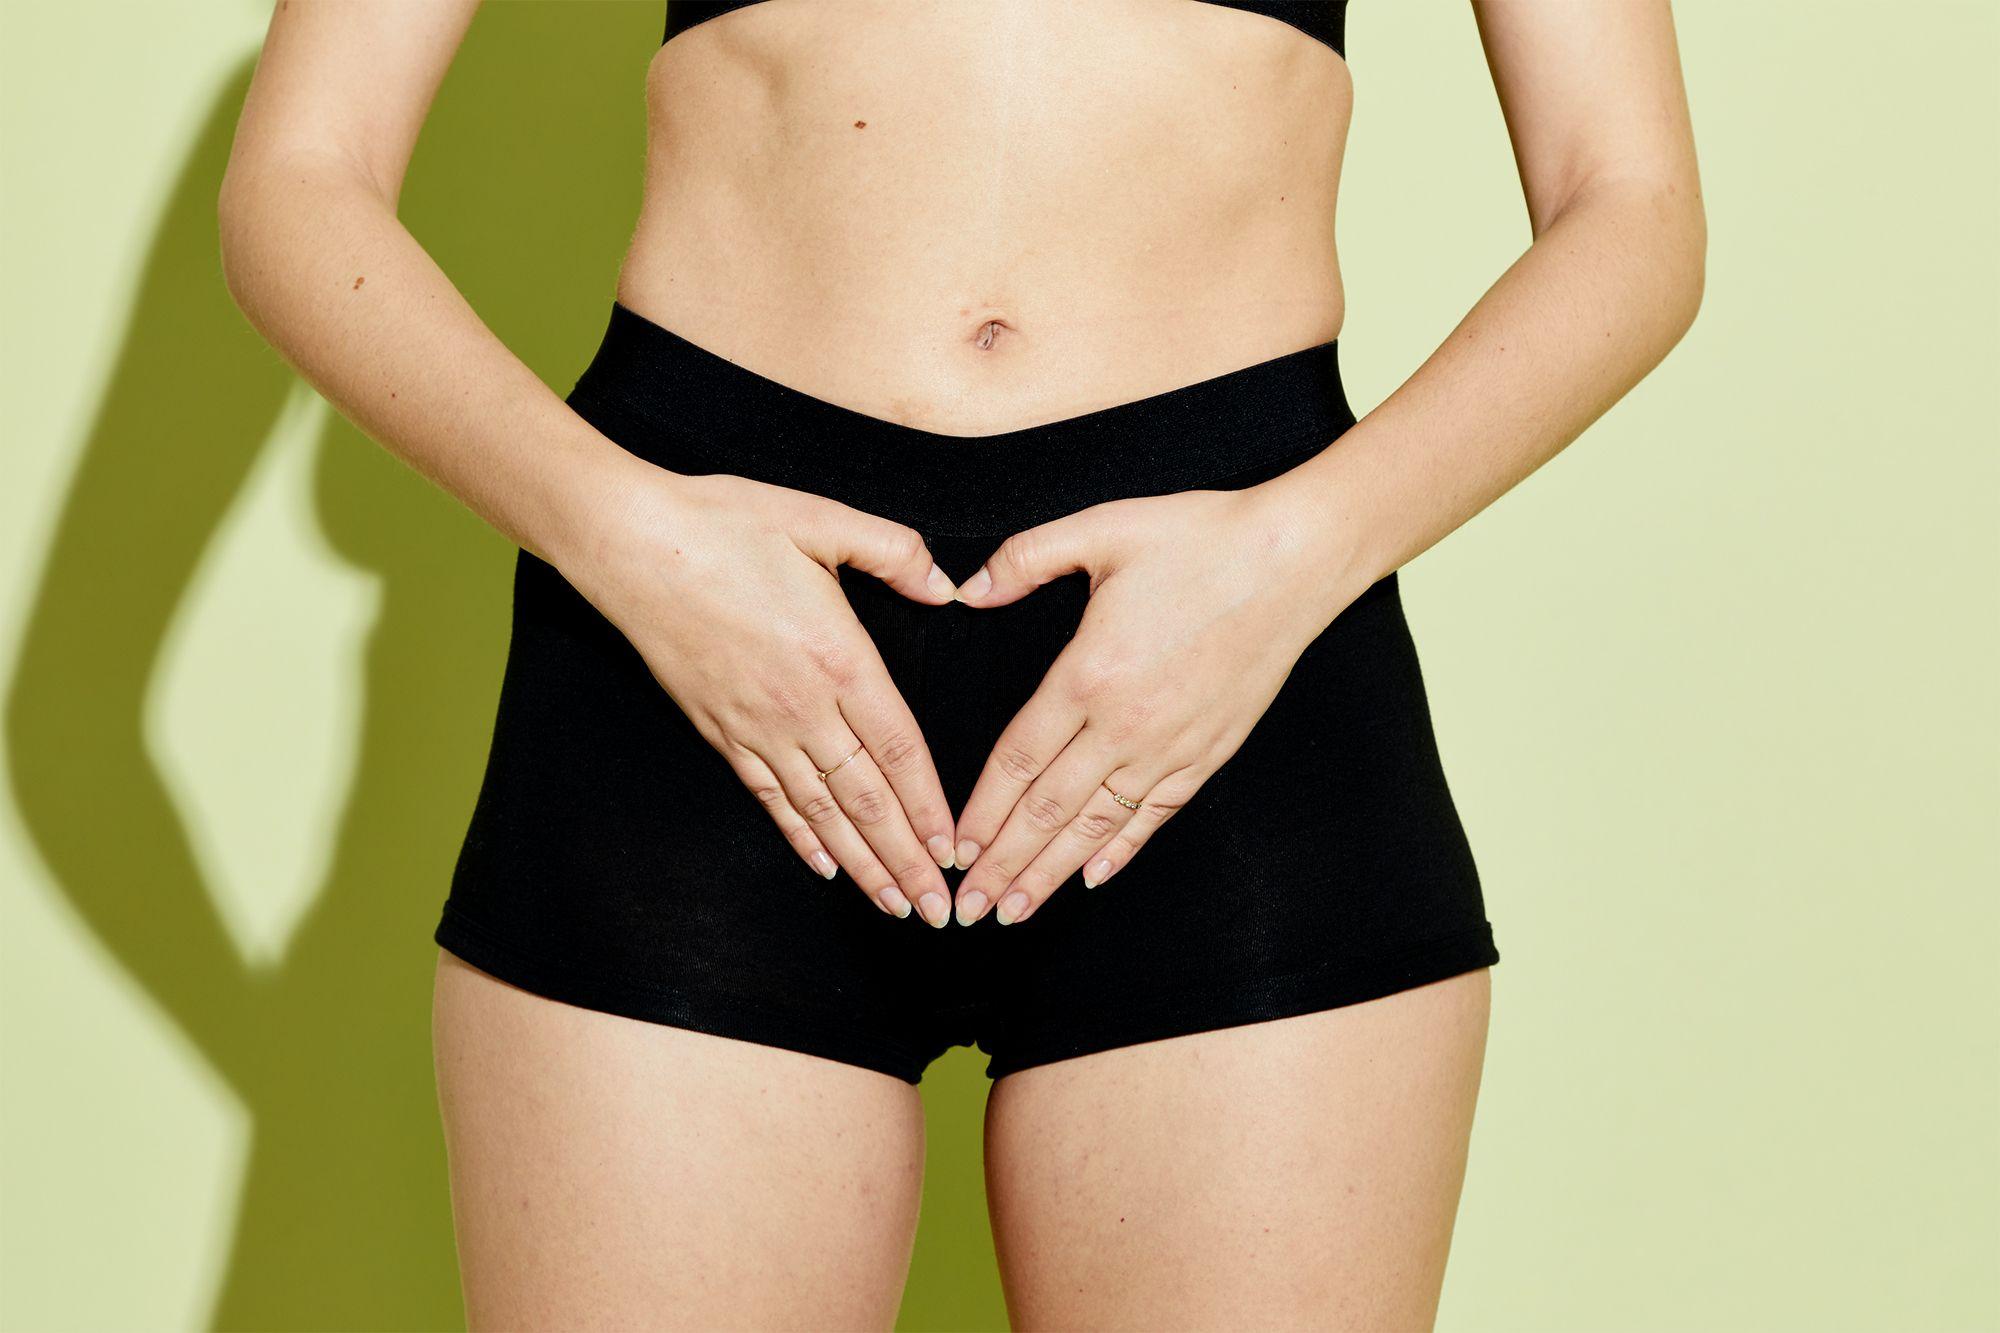 Fotos vagina